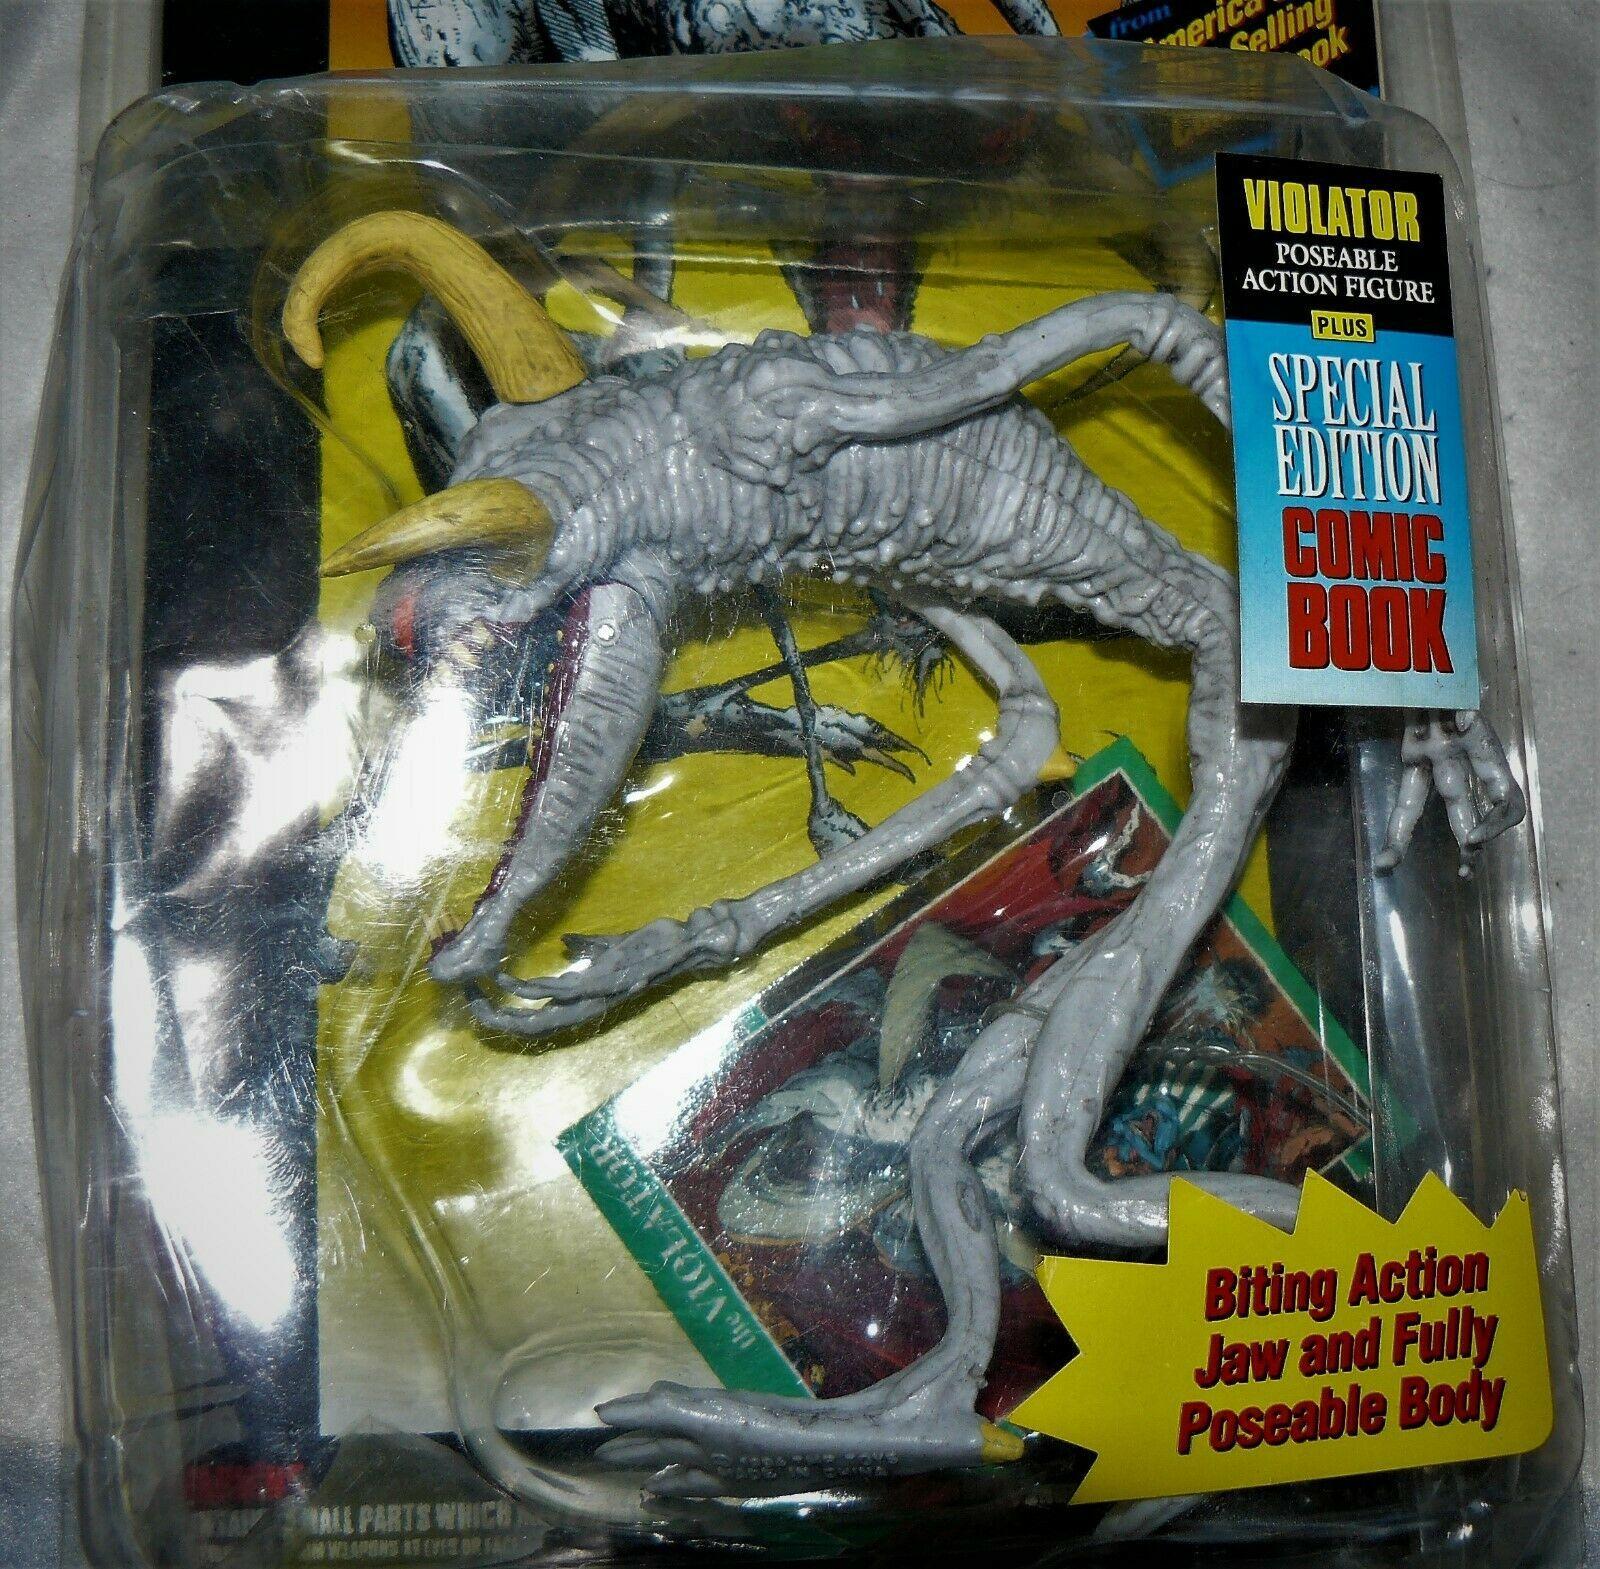 Spawn Series 1 Violator Action Figure w/Comic Book McFarlane Toys 1994